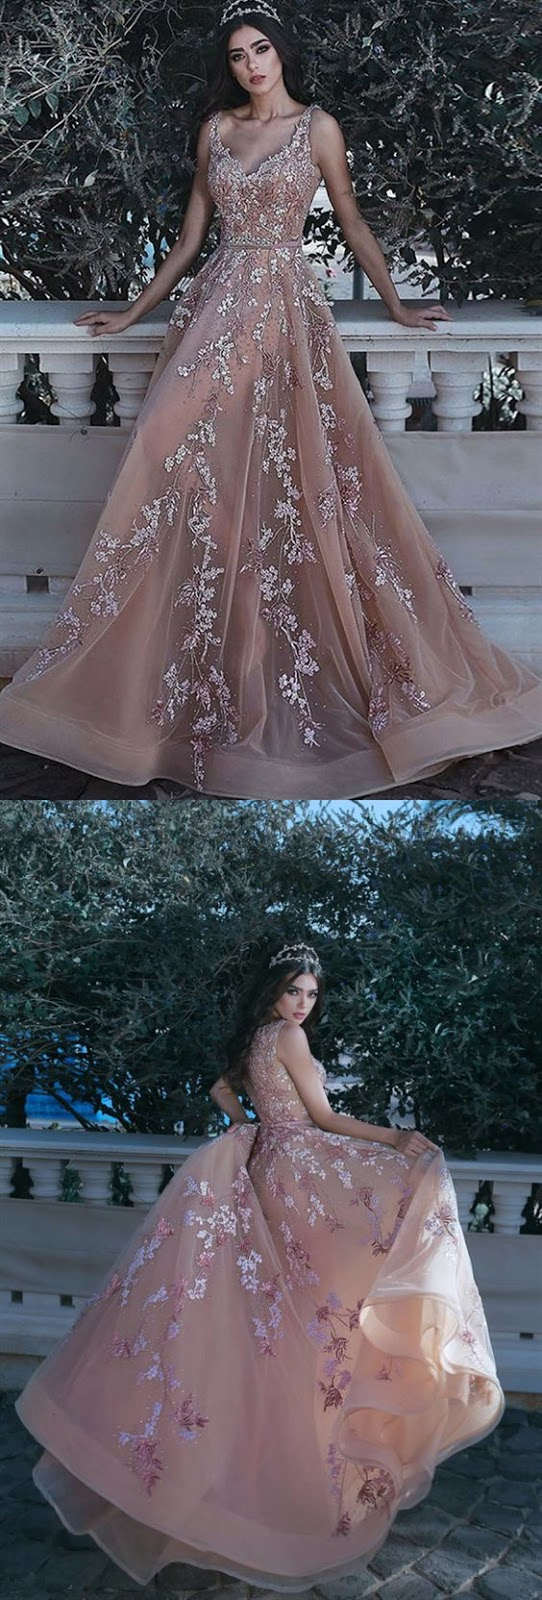 احدث فساتين سواريه لعام 2020 احدث فستان غير محجبات